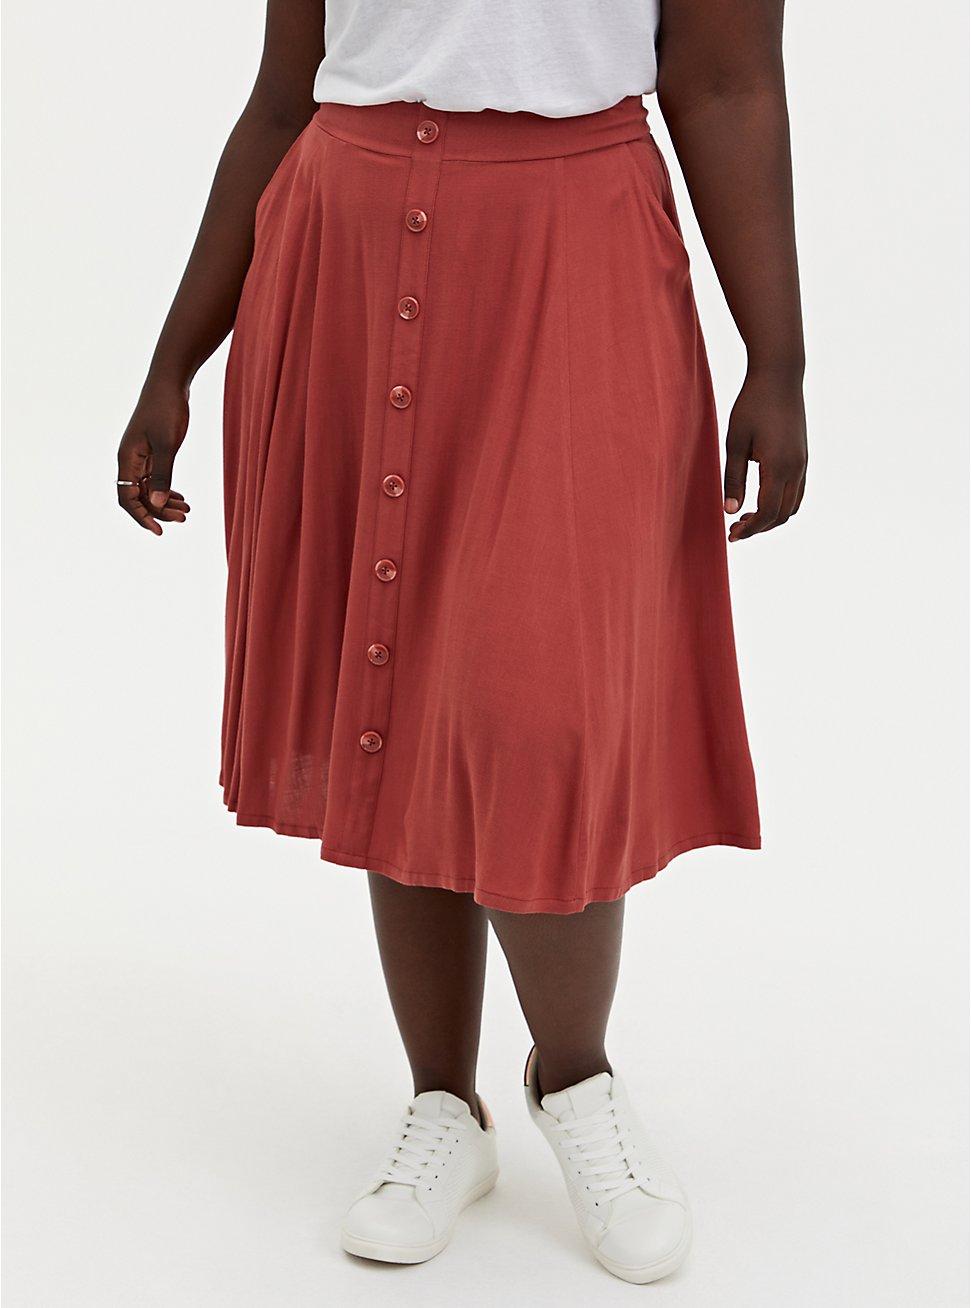 Marsala Red Button Up Midi Skirt, MARSALA, hi-res